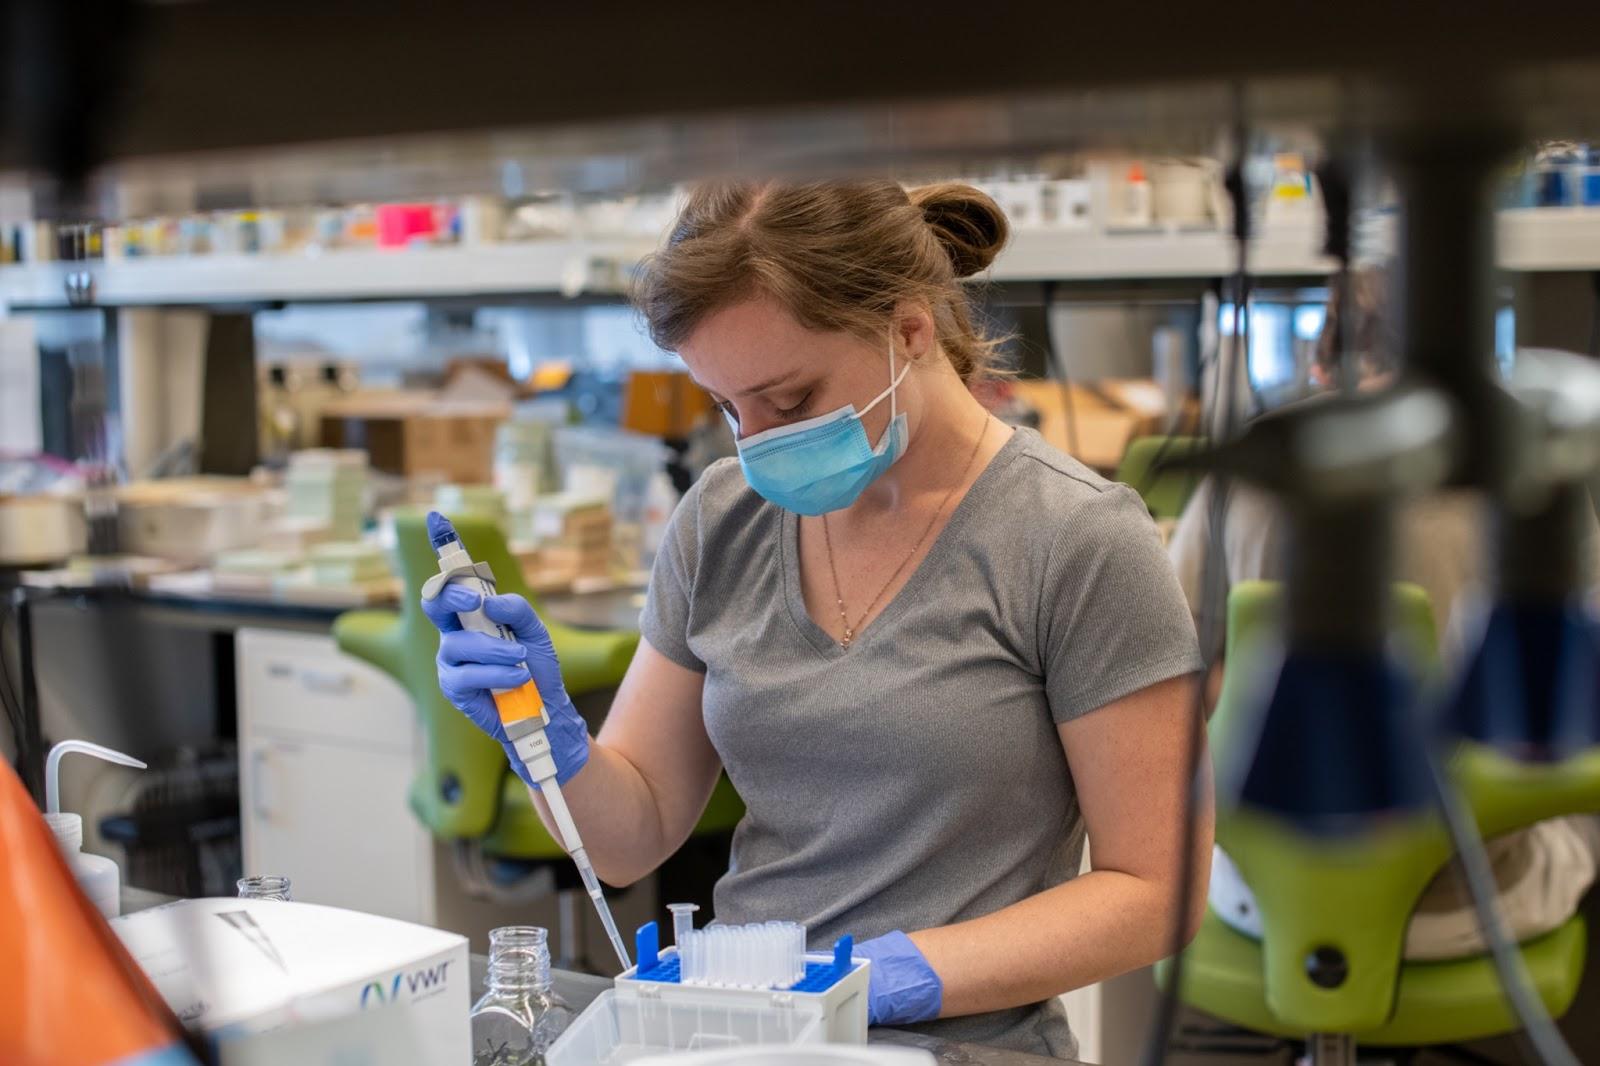 Brianna de la Houssaye working in a lab.